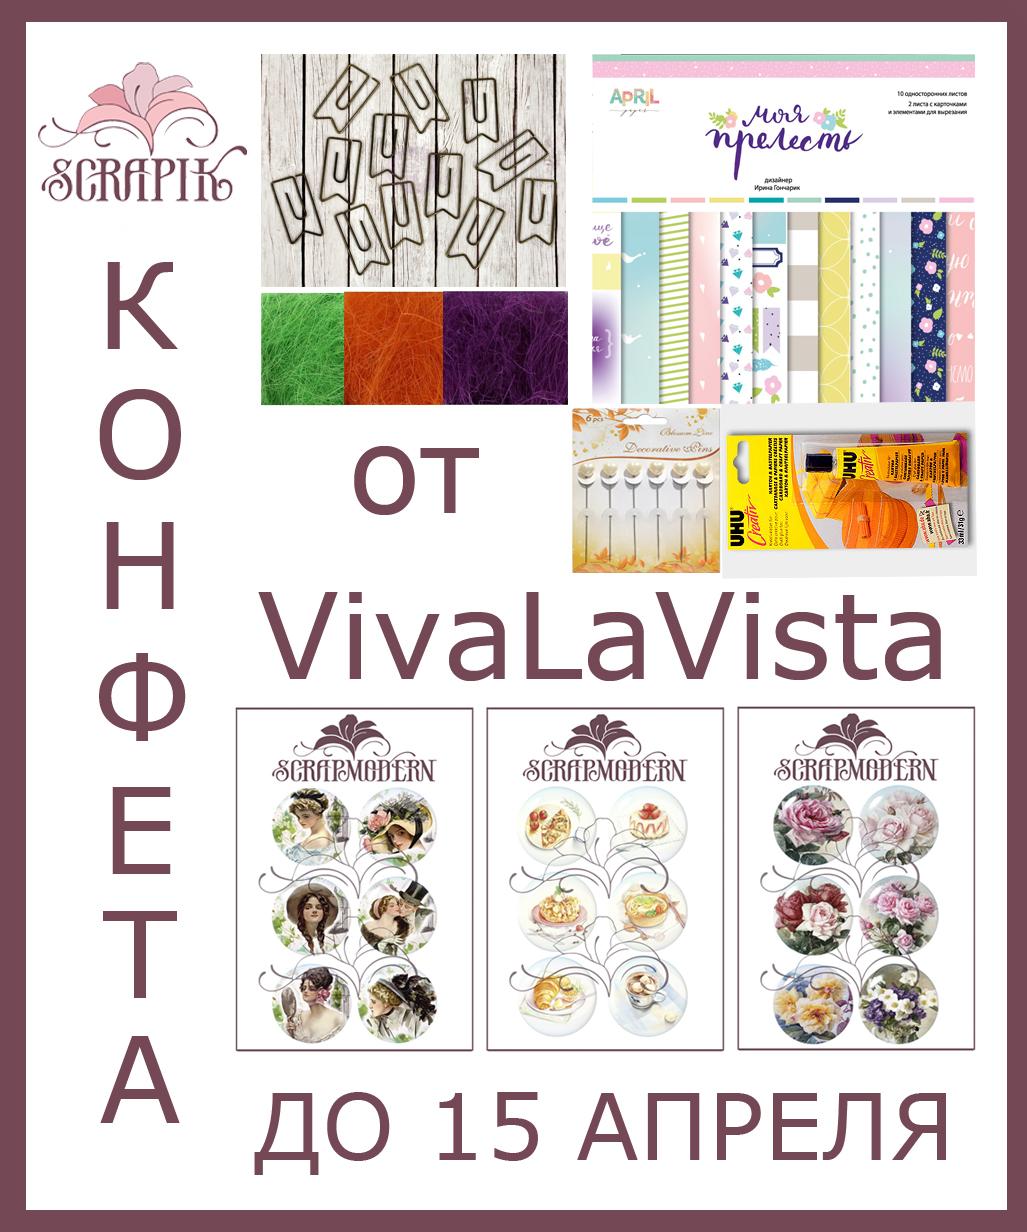 Конфетка от VivaLaVista